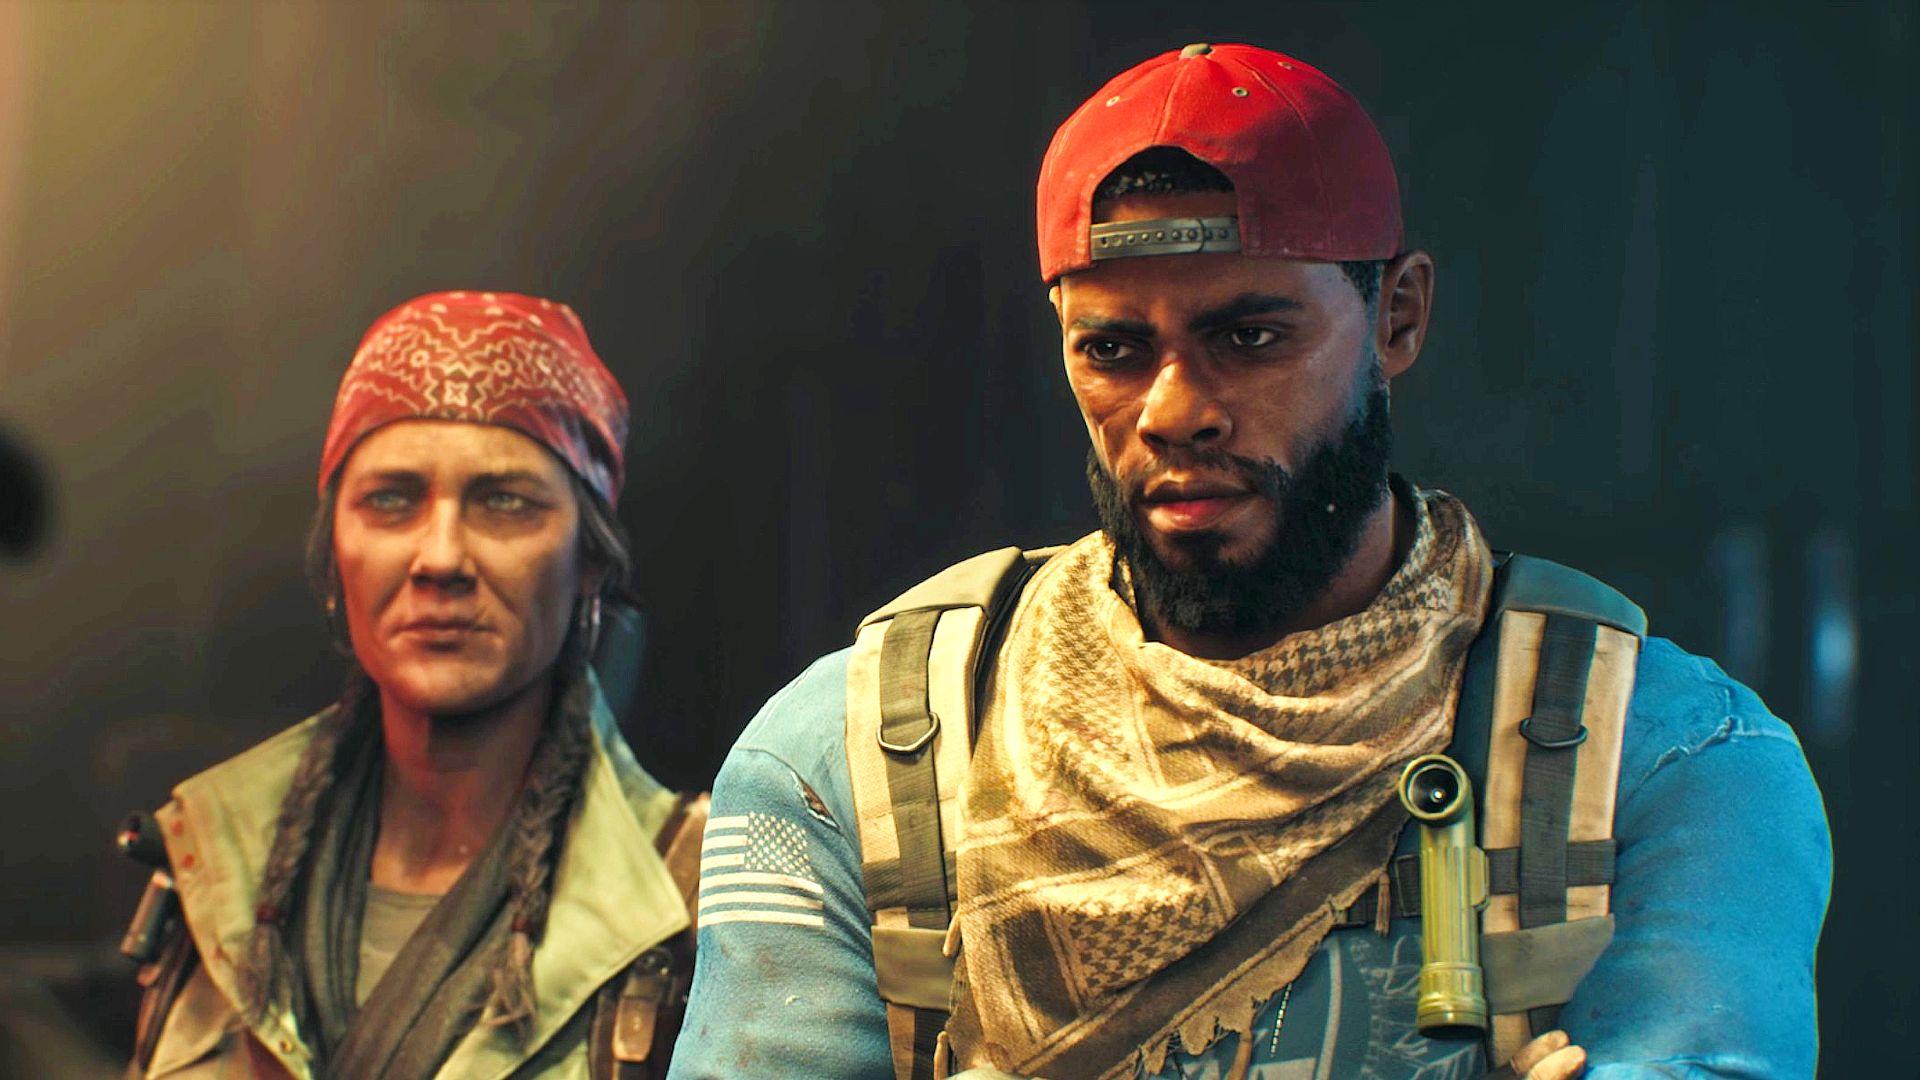 Back 4 Blood hits six million players since launch